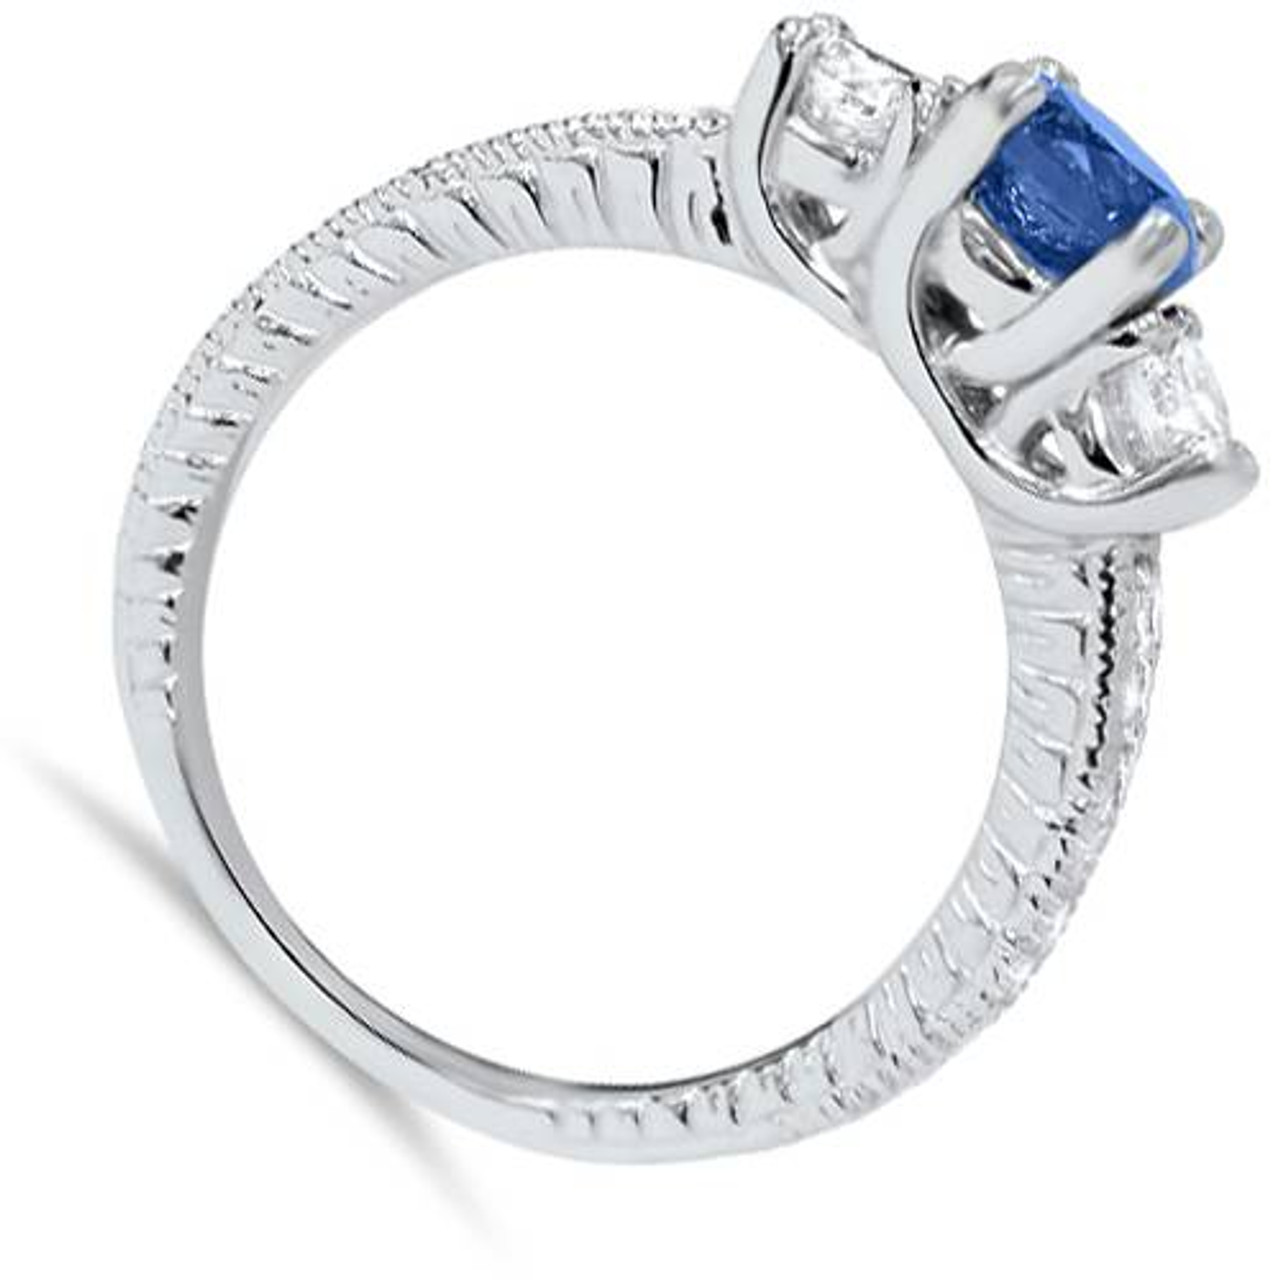 1ct Vintage Blue Diamond 3 Stone Engagement Ring 14K White Gold (G/H, I1 I2)